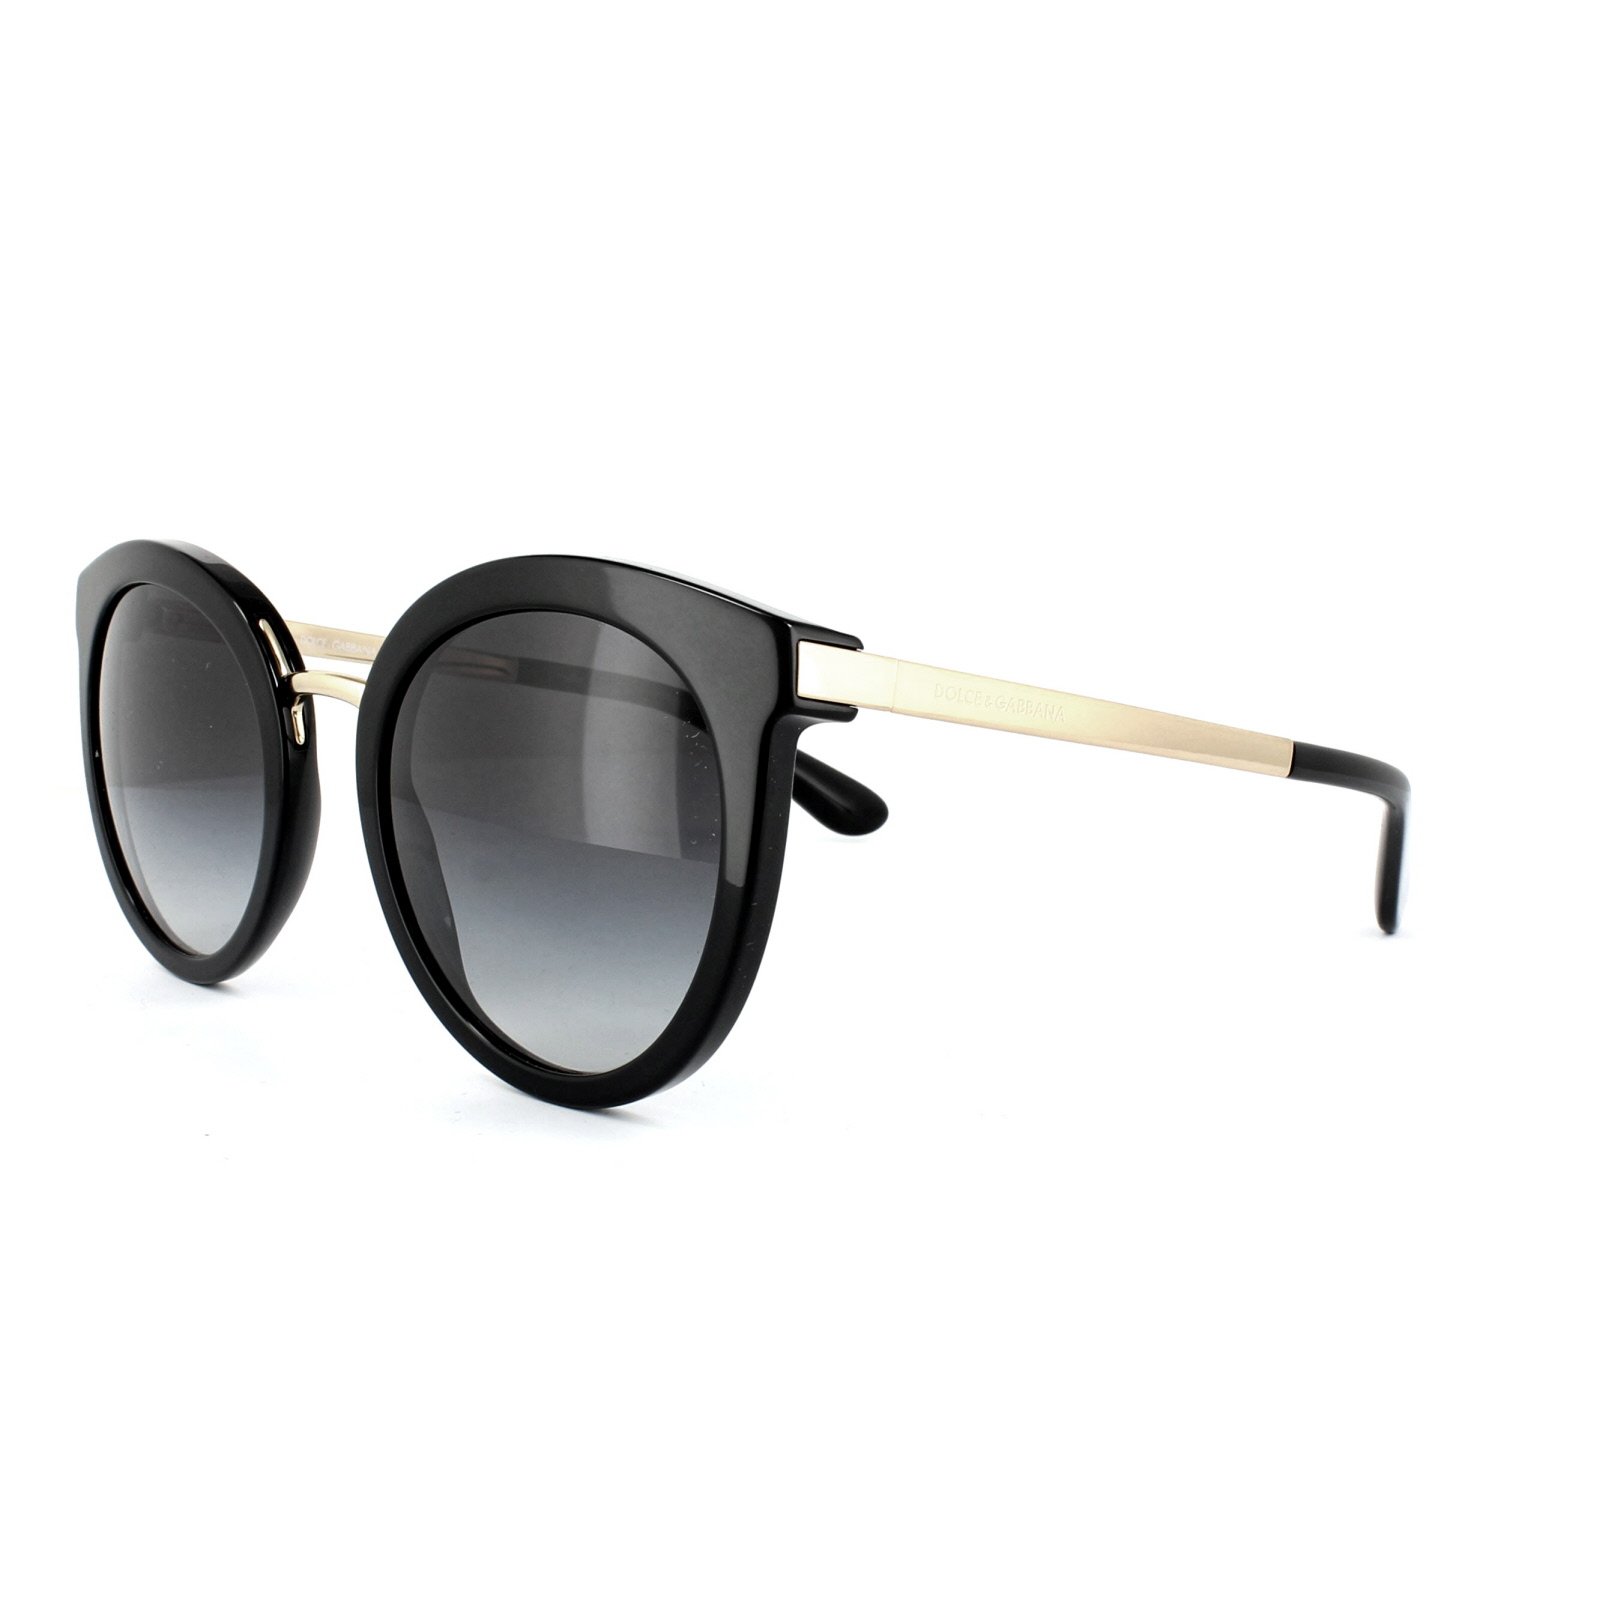 Sentinel Dolce   Gabbana Sunglasses 4268 501 8G Black Grey Gradient 22a4c735f0c9